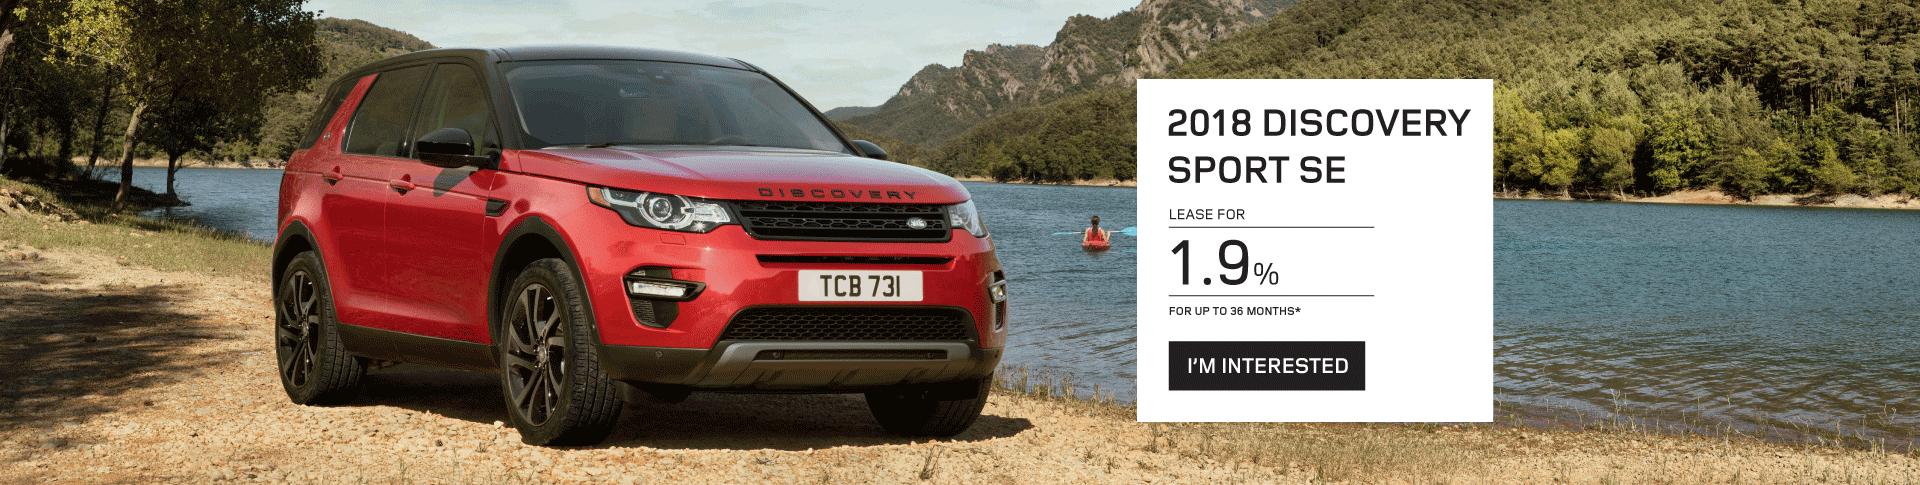 2018 Discovery Sport SE